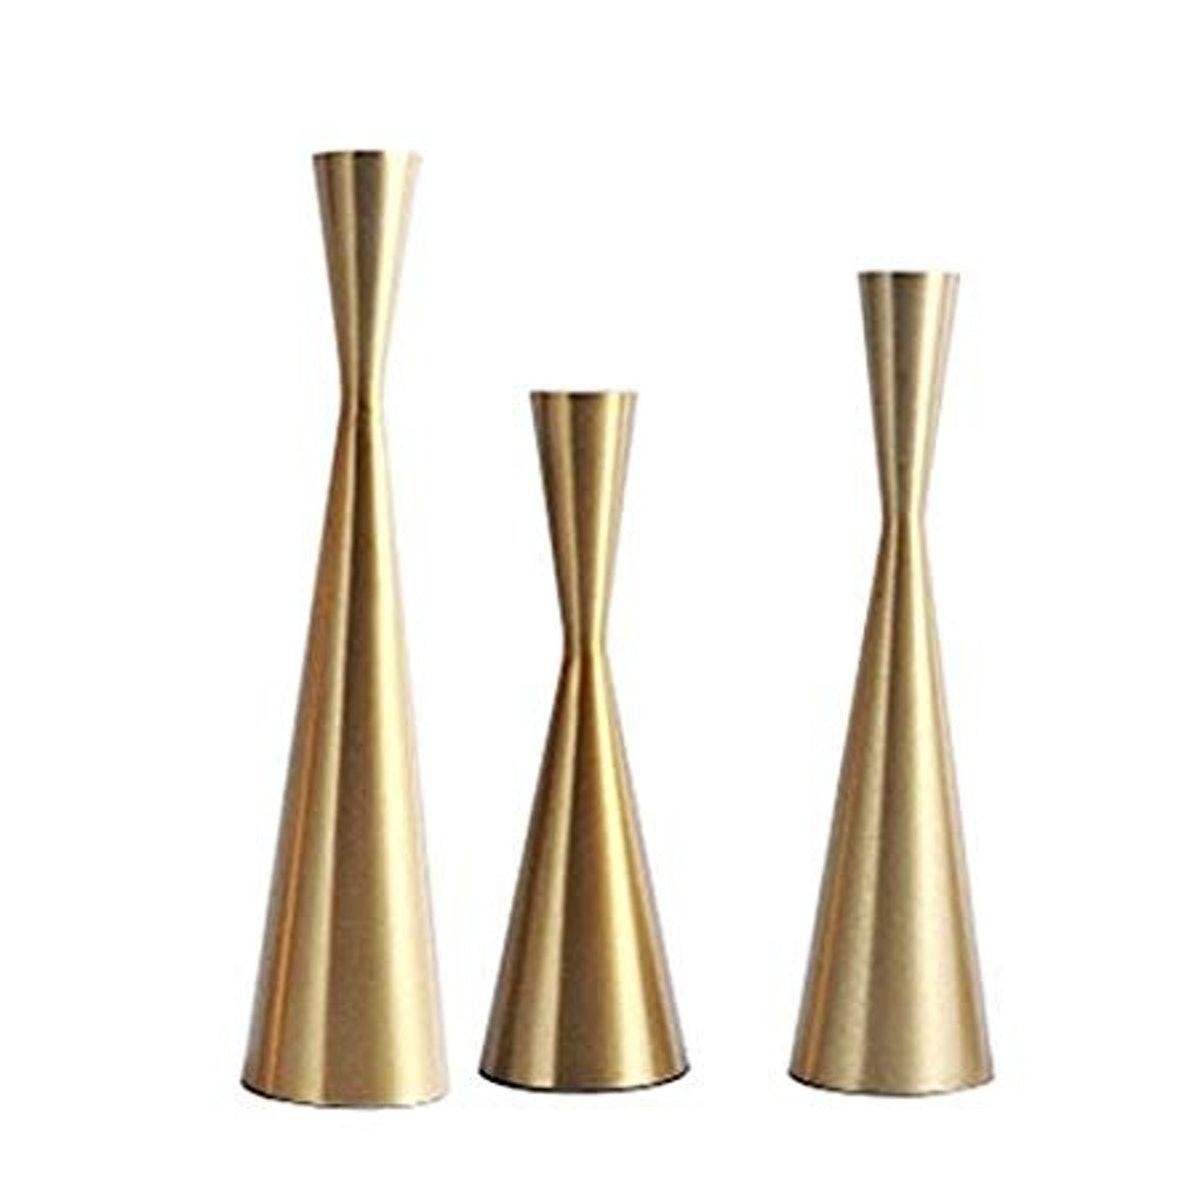 Minimalist Brass Candlesticks (Set of 3)